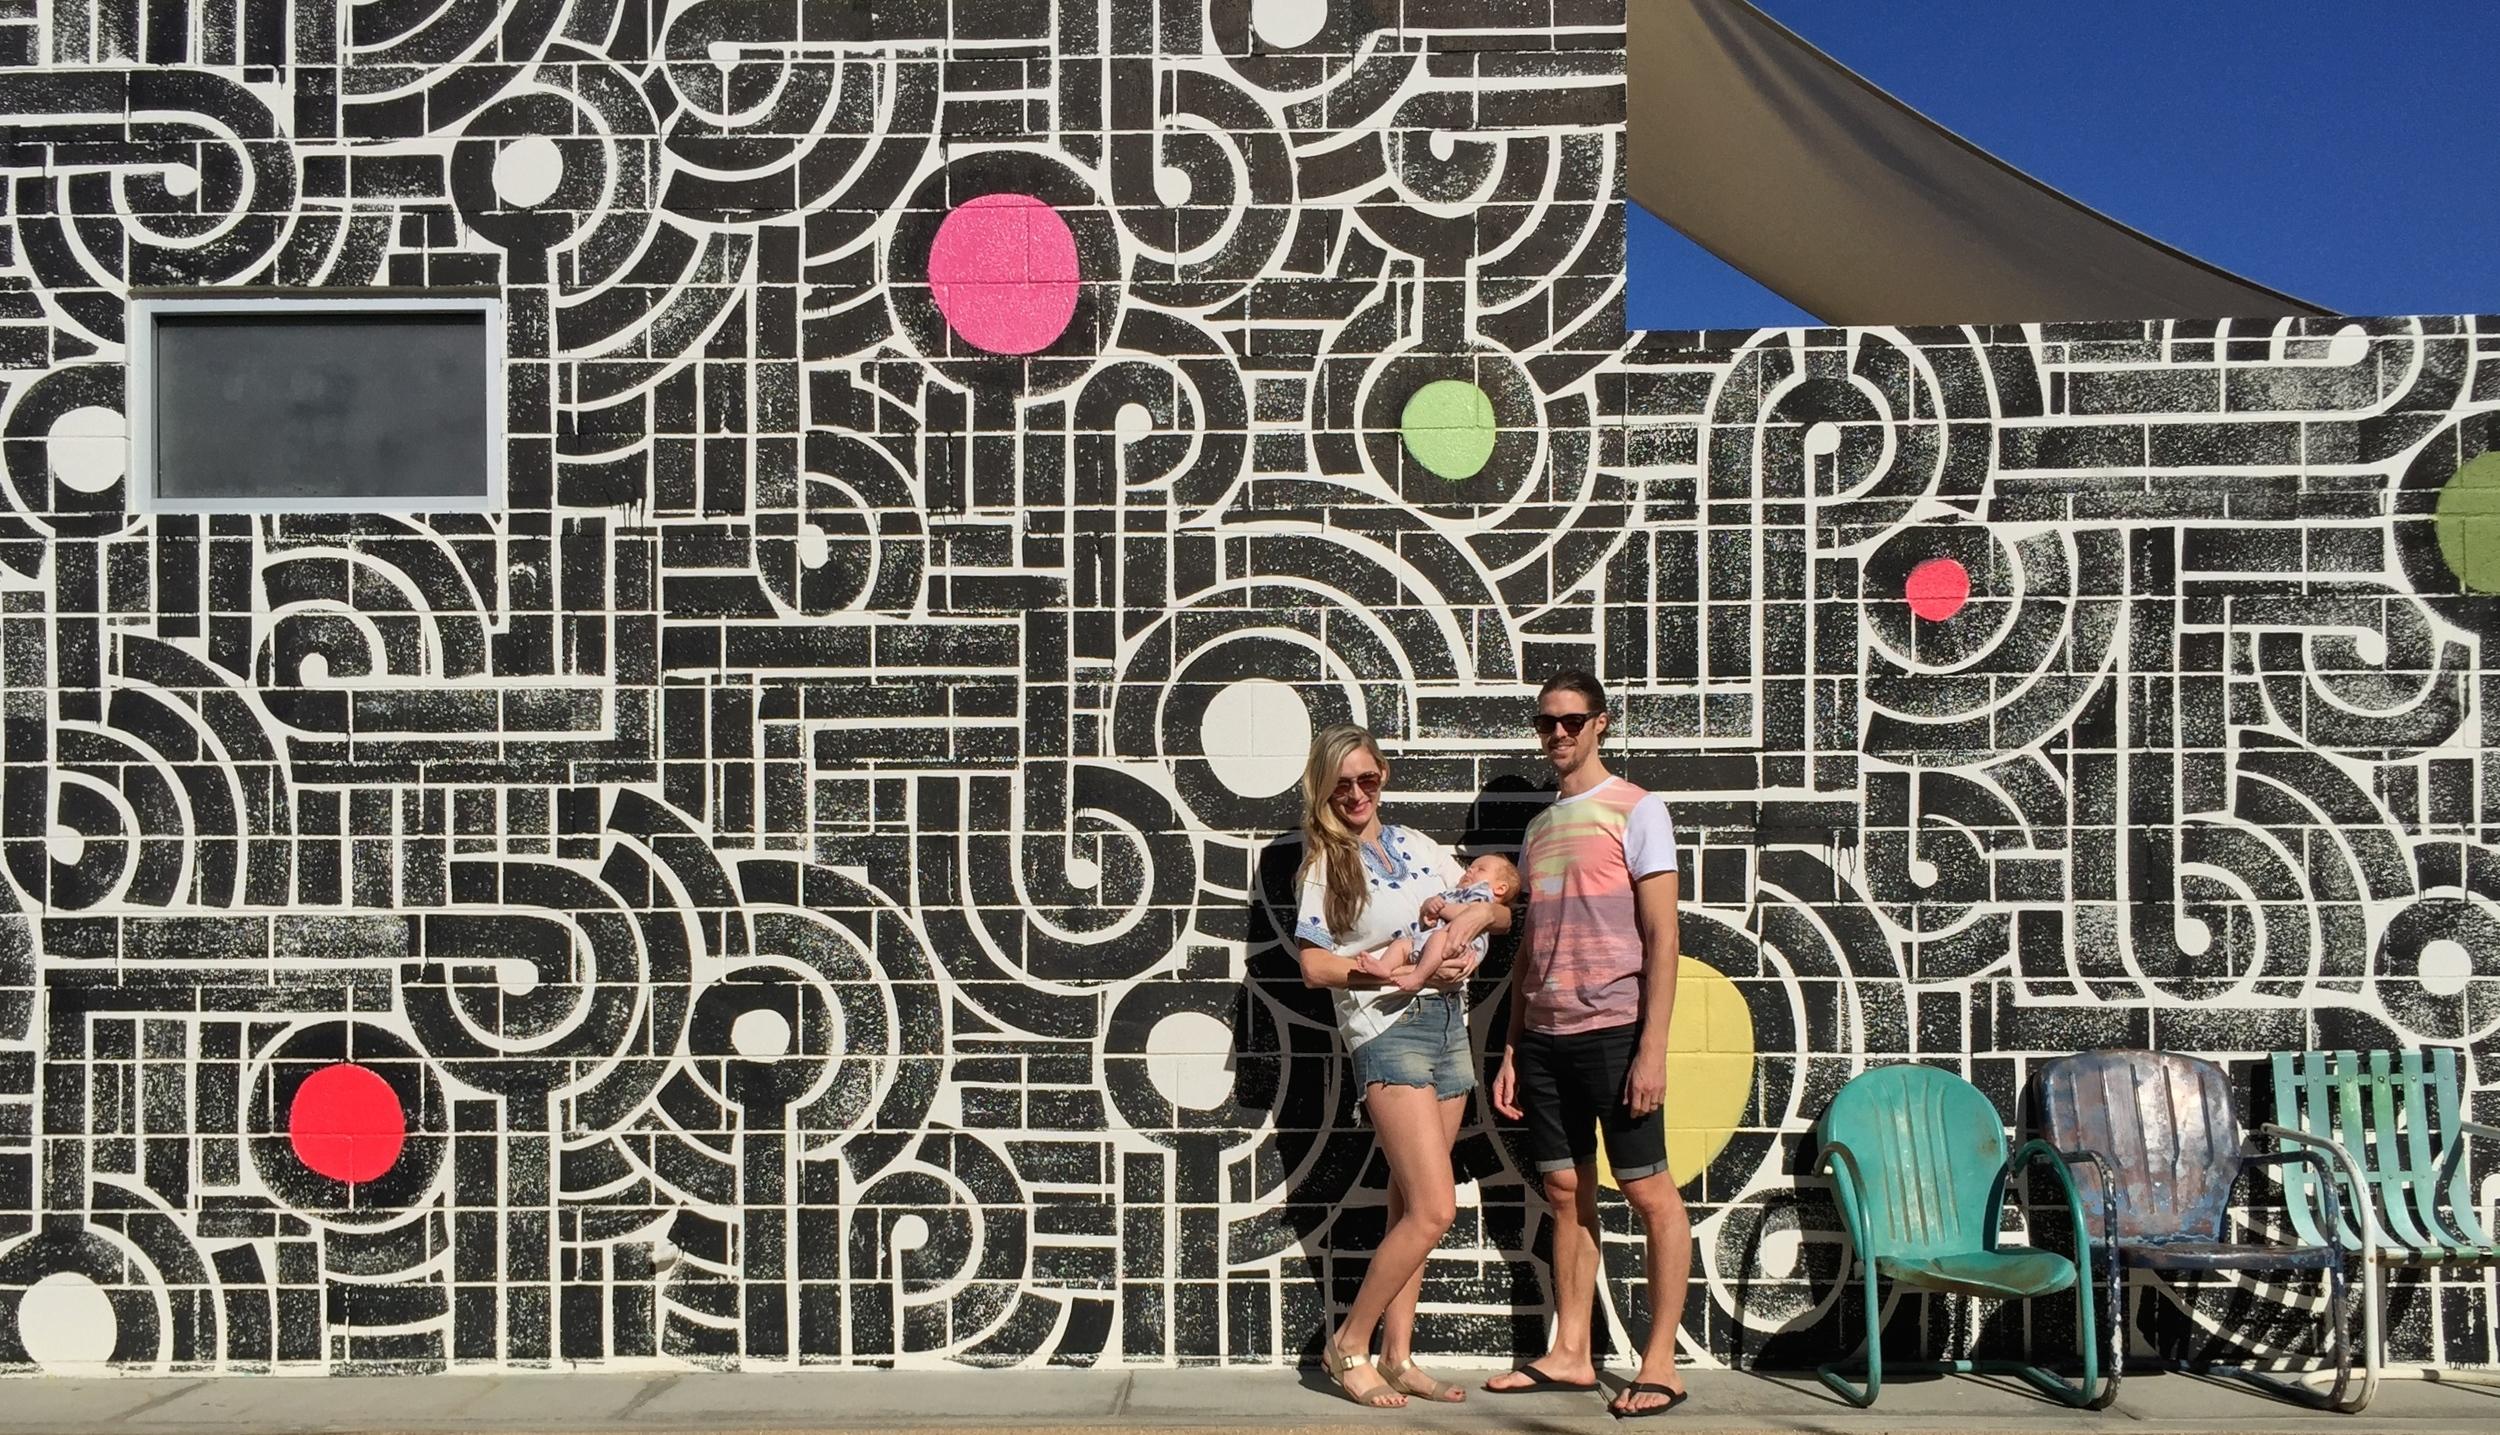 We had to. The Aaron Delacruz-designed wall was too cool.